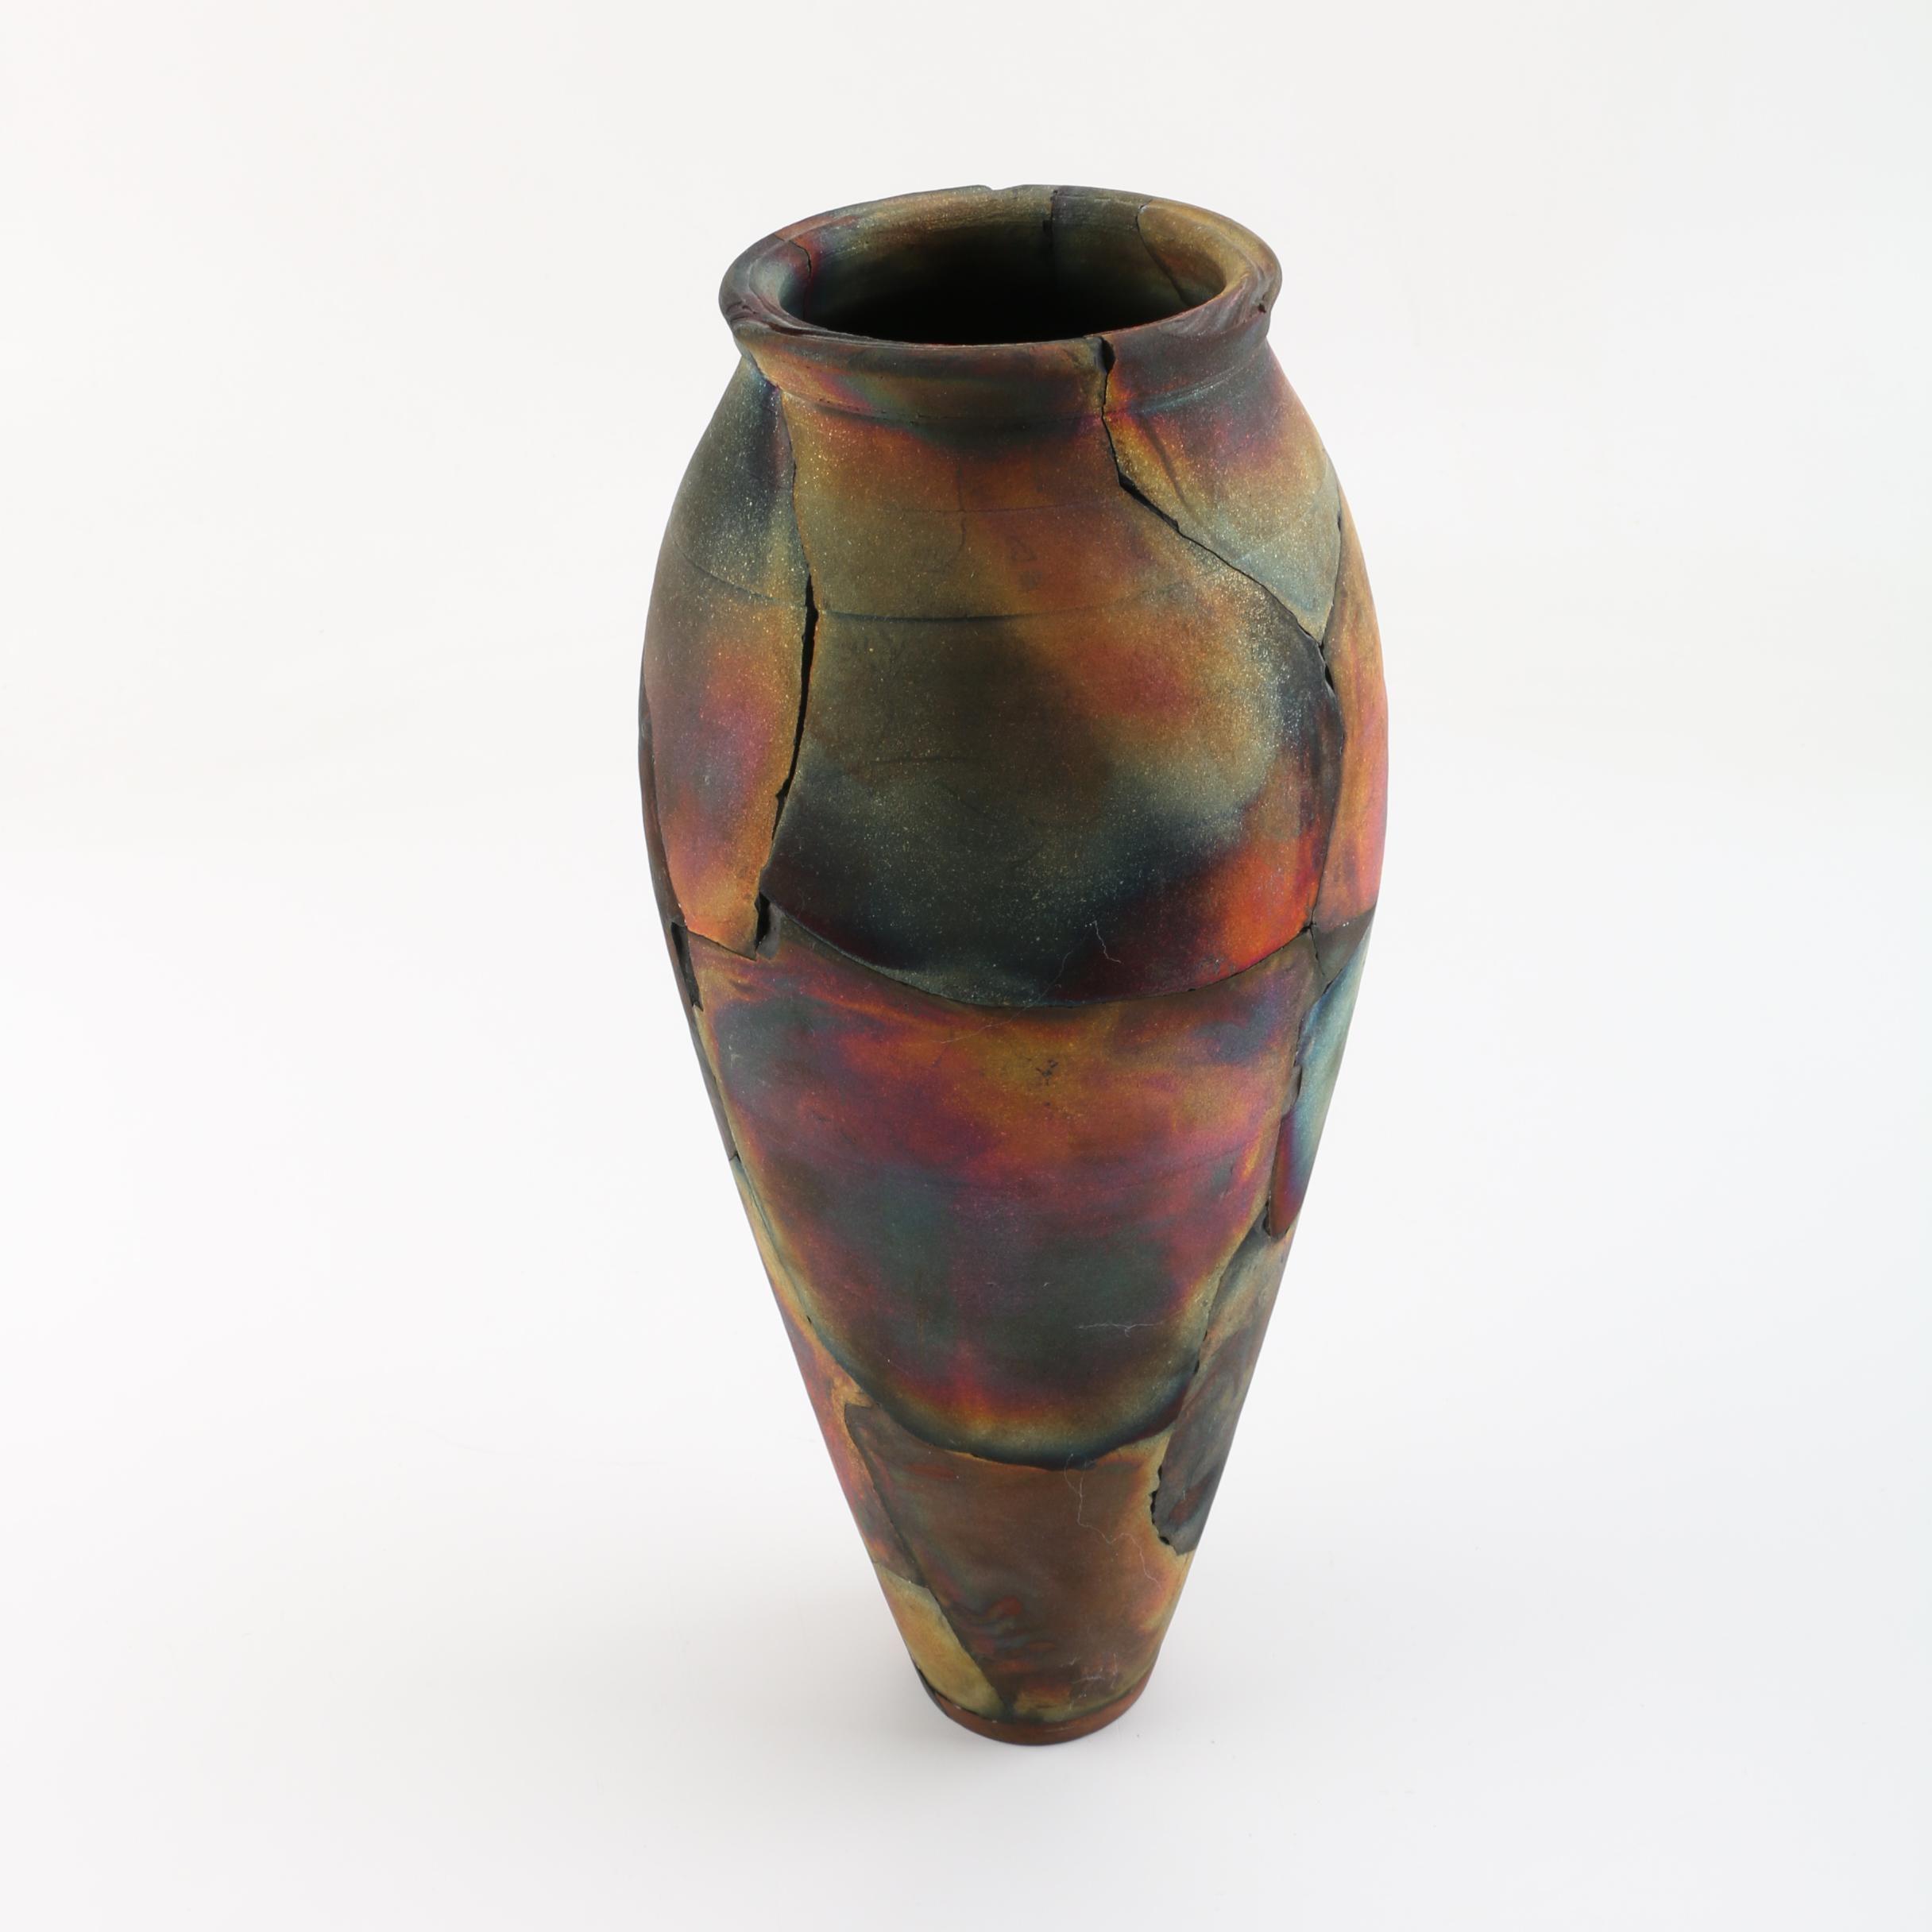 Signed, Wheel Thrown and Altered Raku Fired Vase